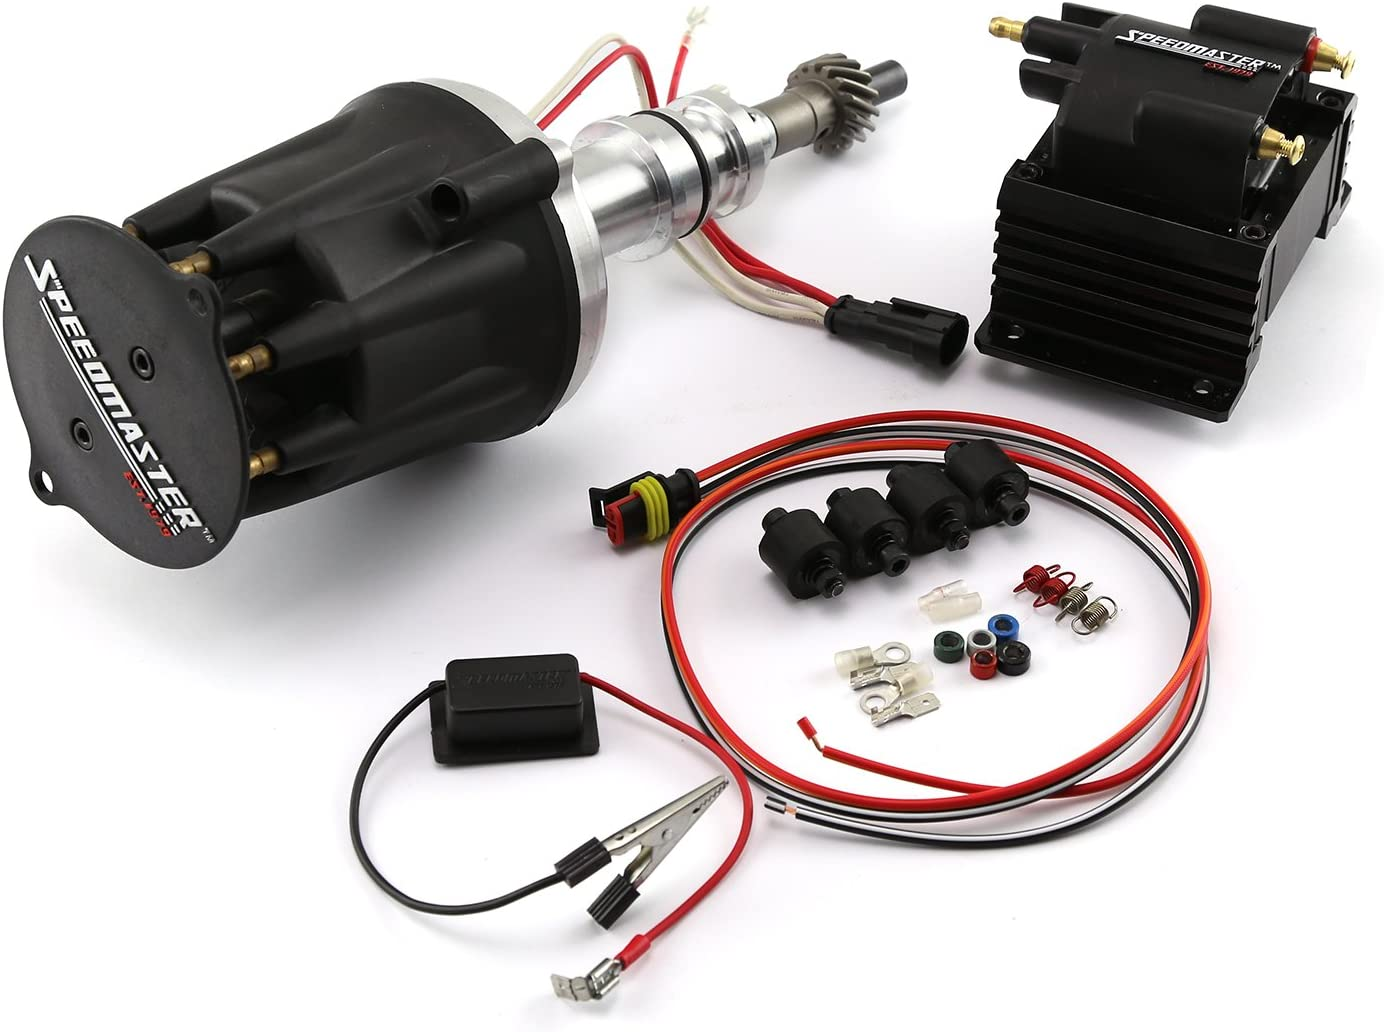 Speedmaster 1-385-002 Fits Quality inspection Ford SB 289 El Rayo DNA 302 Windsor Max 66% OFF -